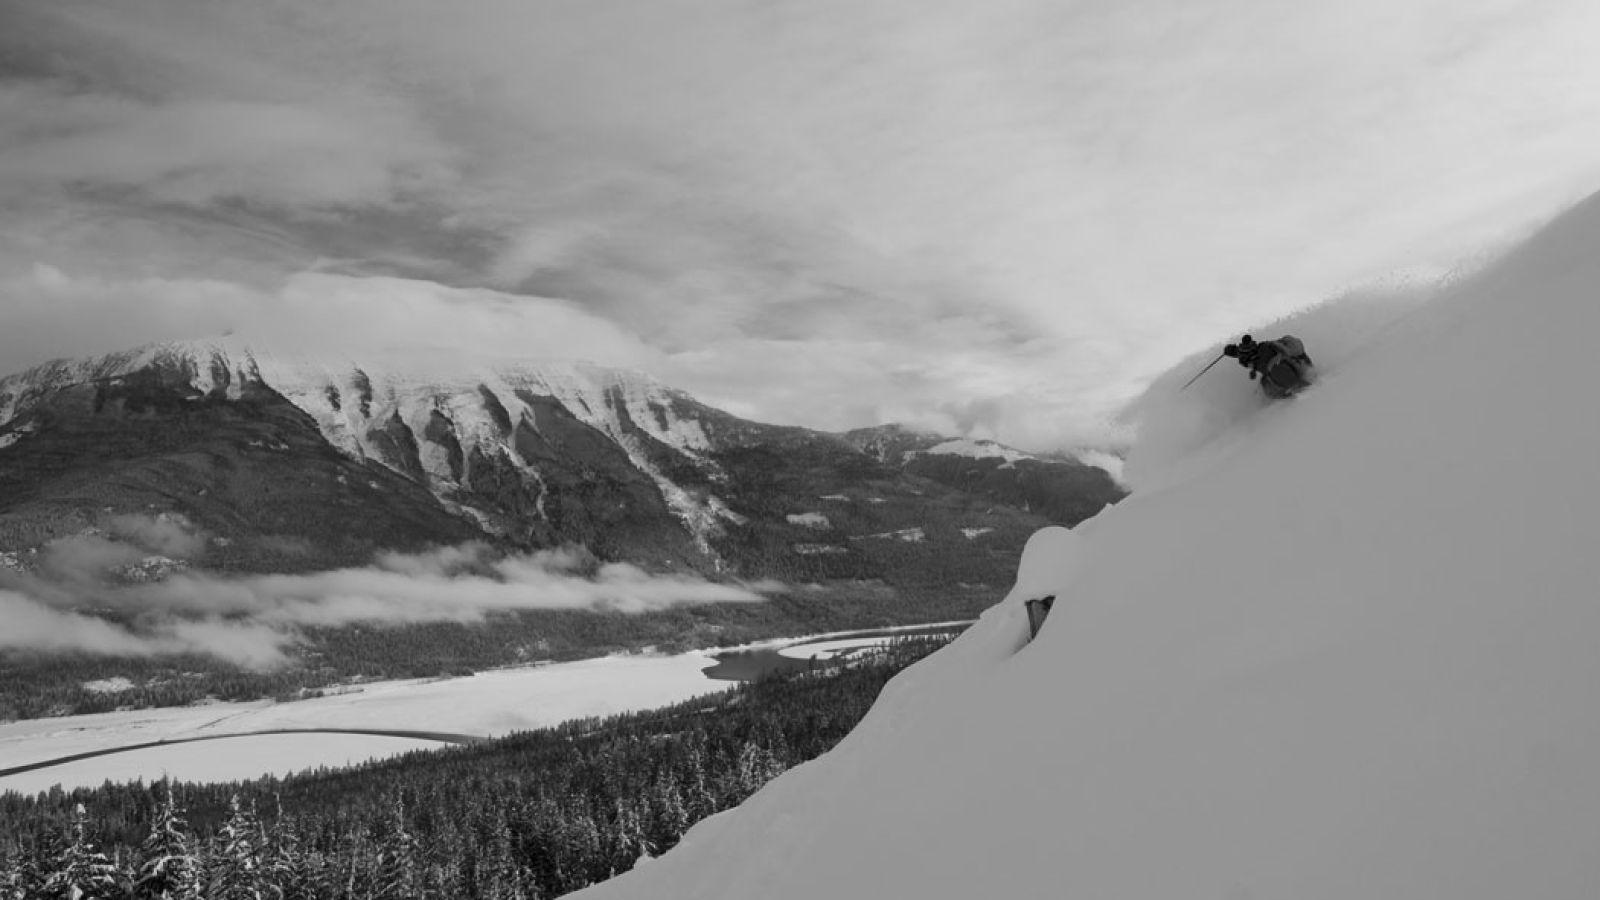 Winter brings outstanding snowsports at Revelstoke Mountain Resort.